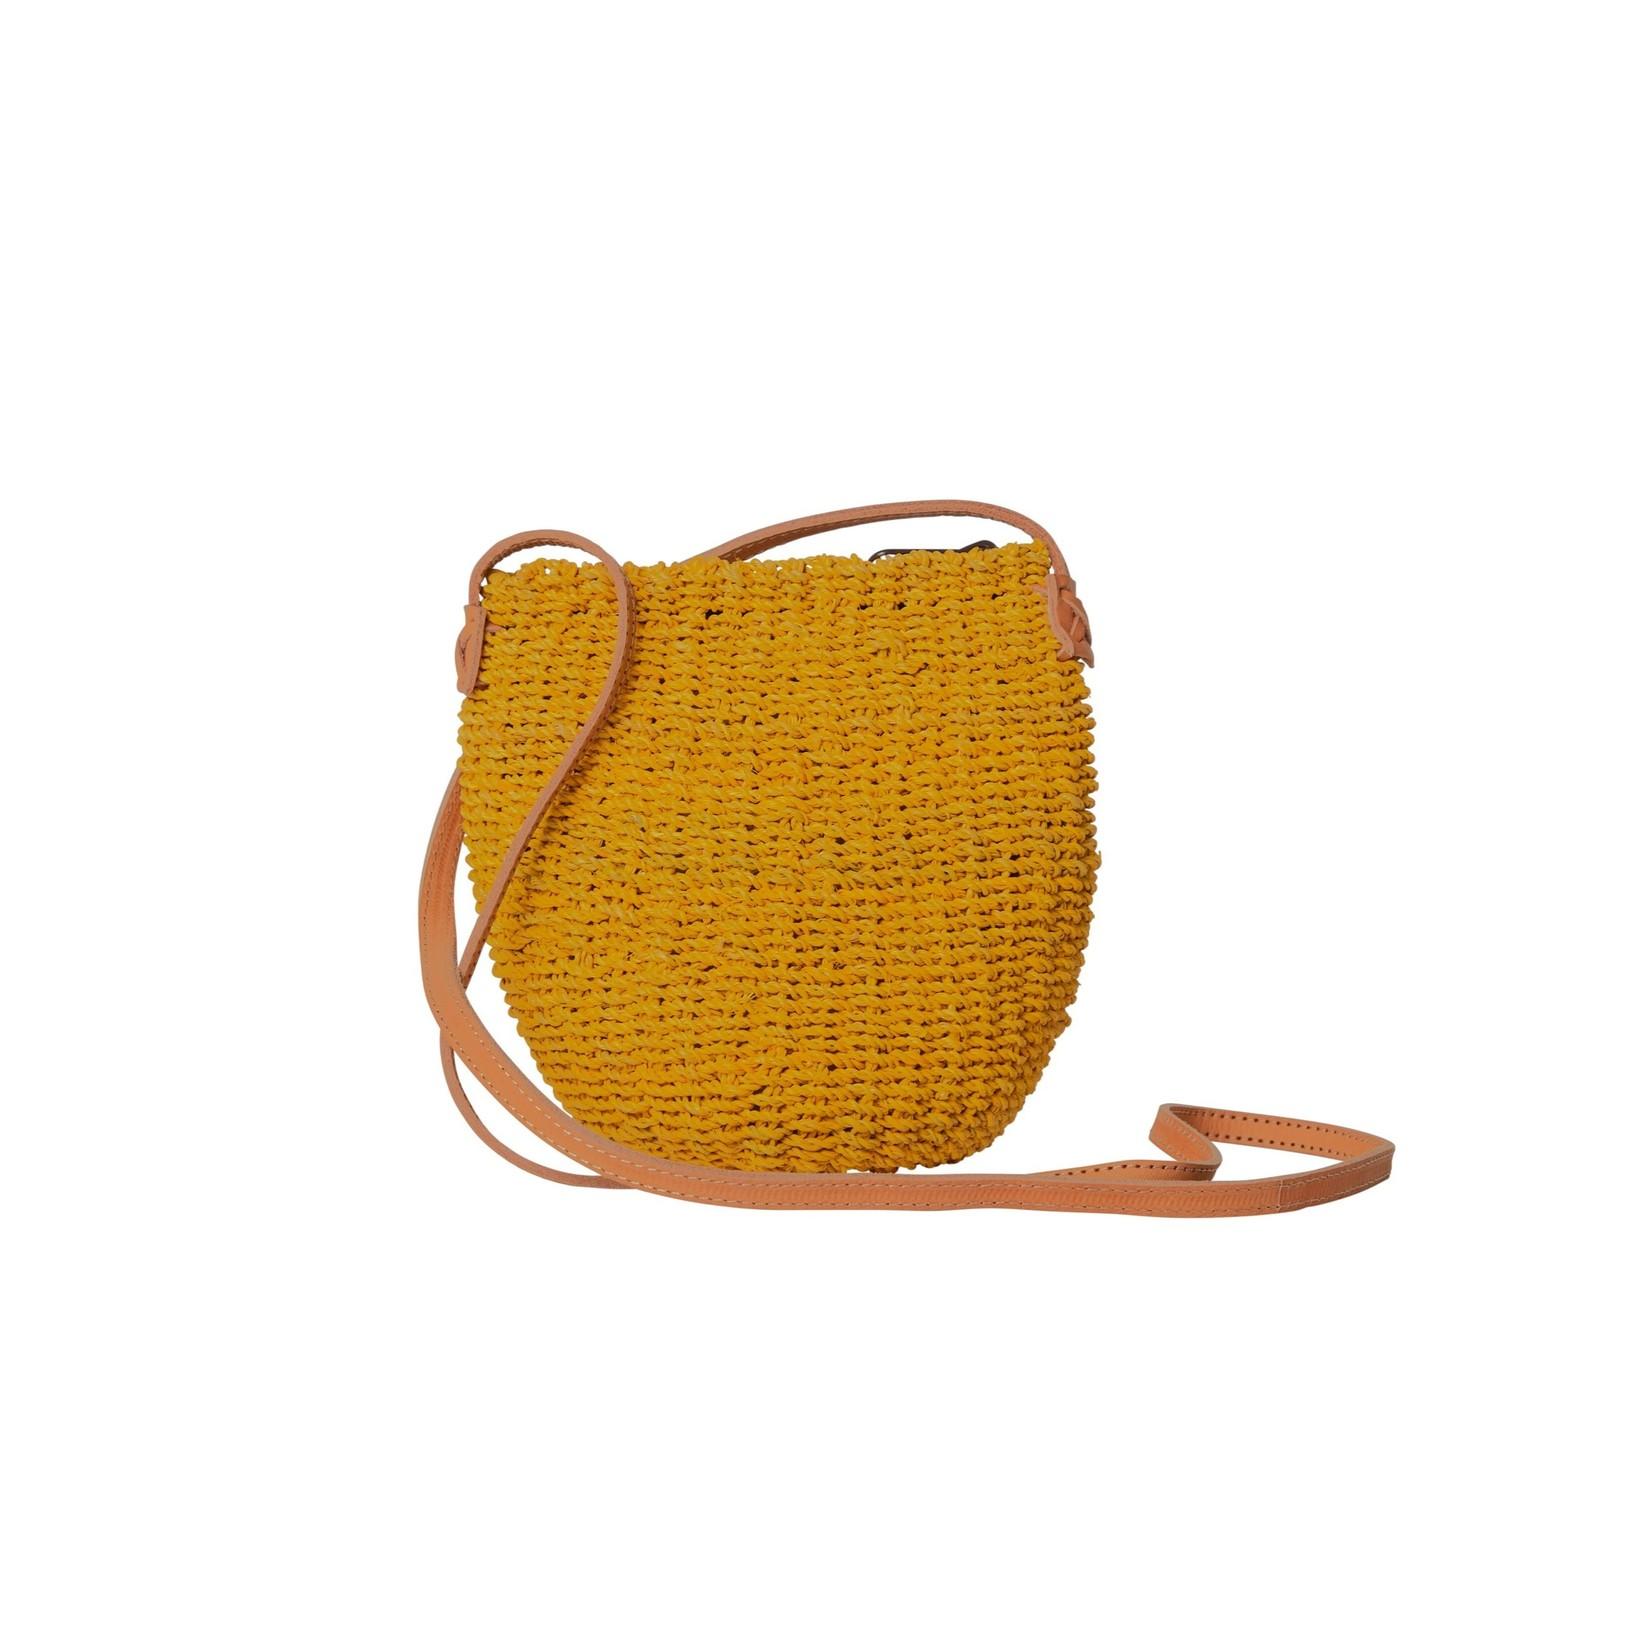 Sarah Stewart The Poof Crossbody Bag